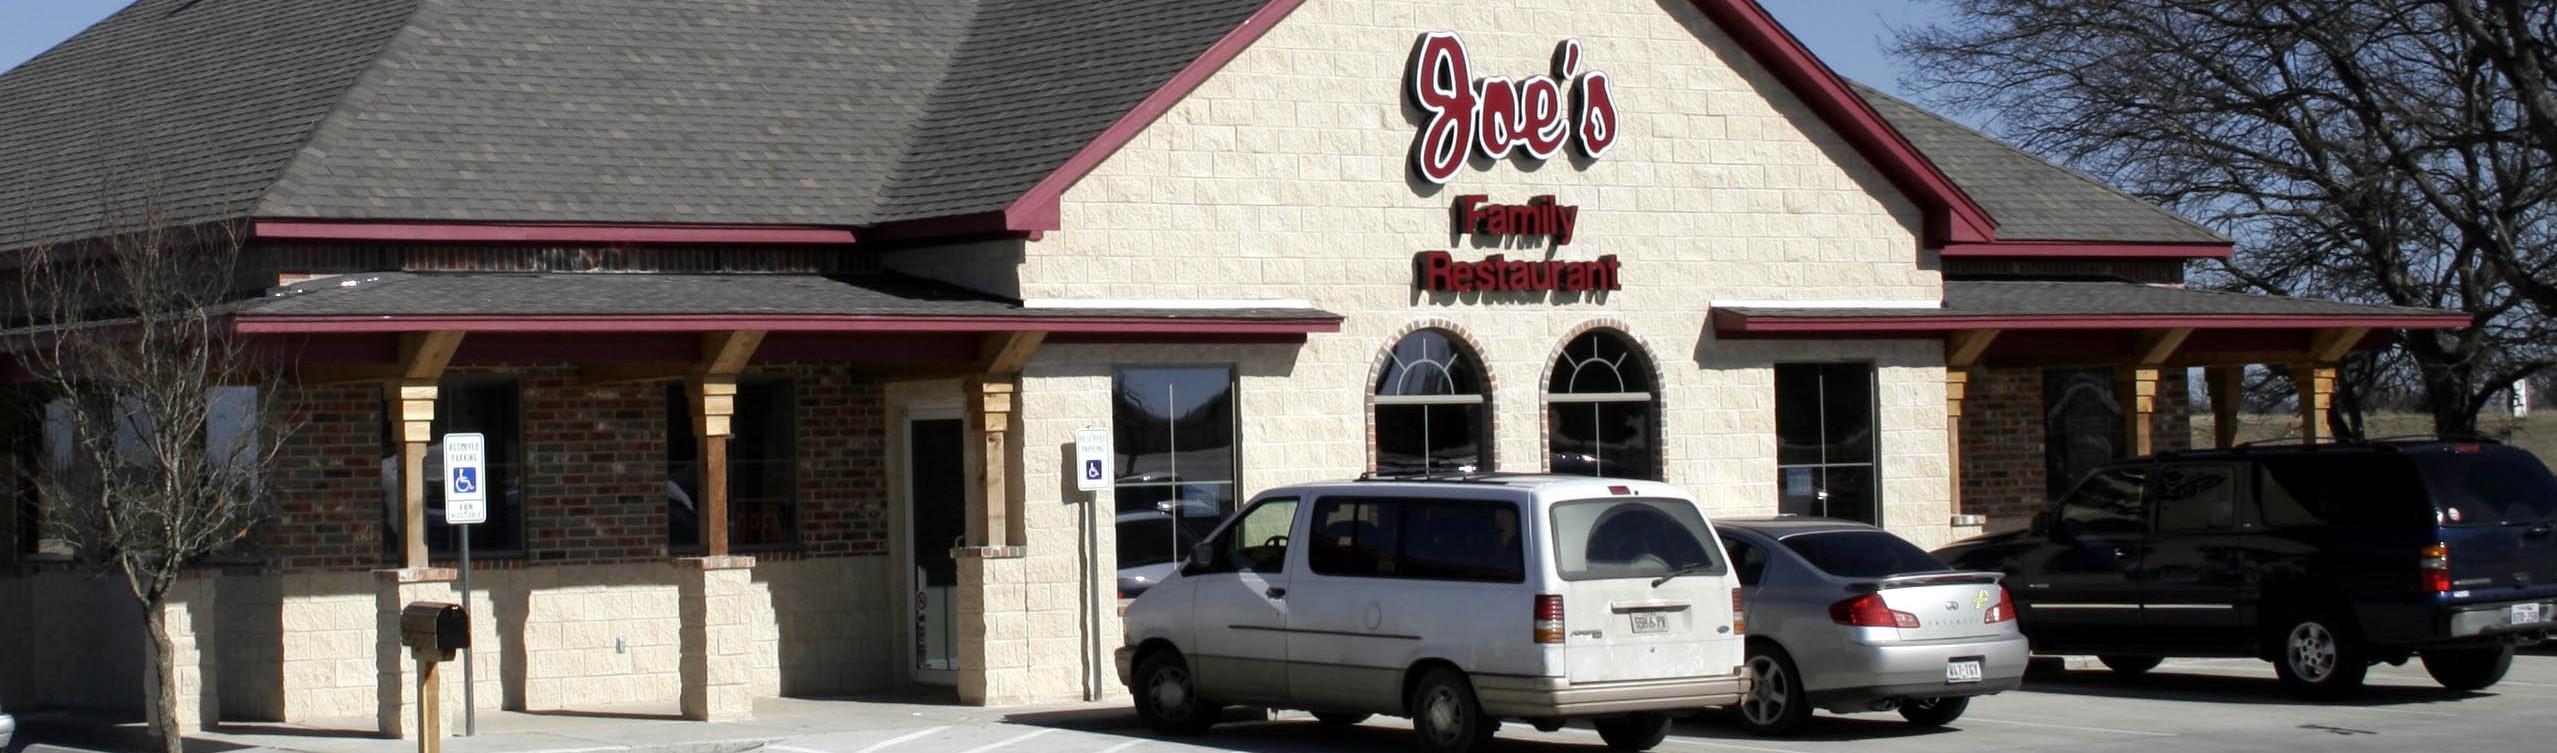 Joes Restaurant Retail Construction Exterior Front